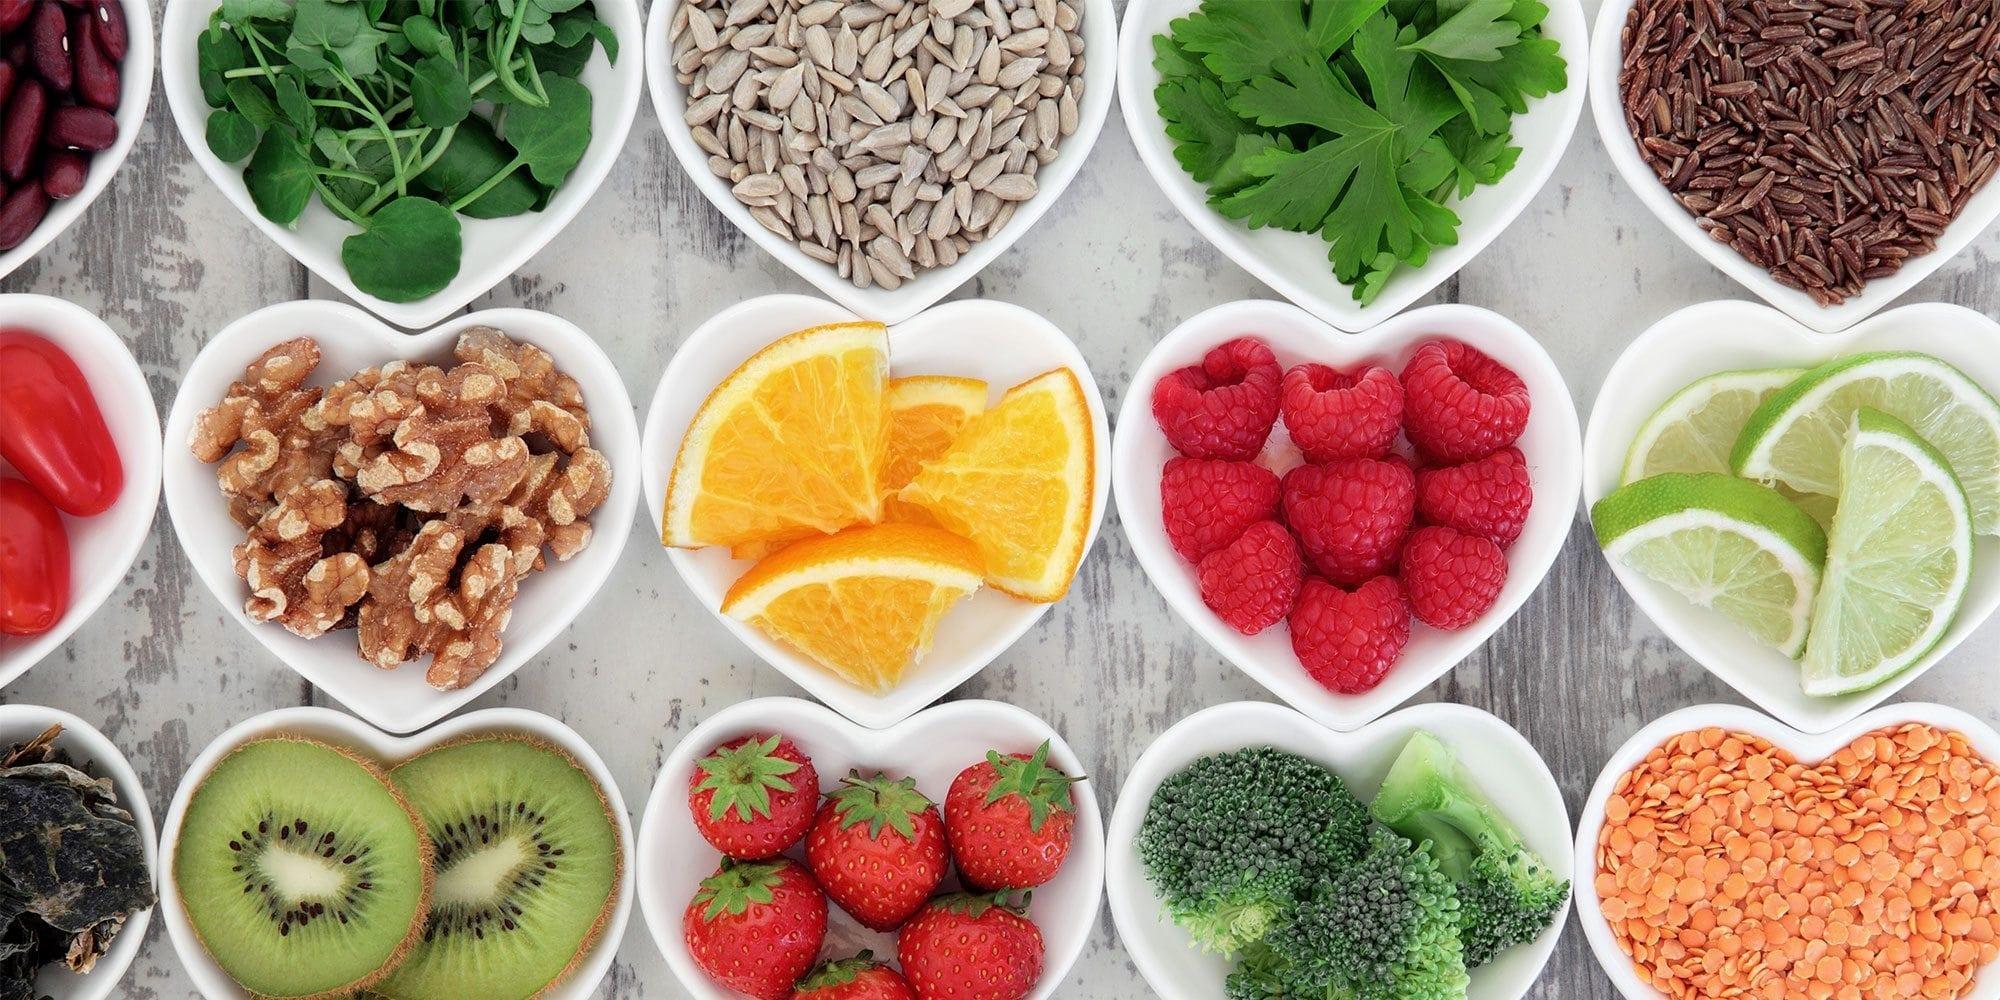 gezond cholesterolgehalte